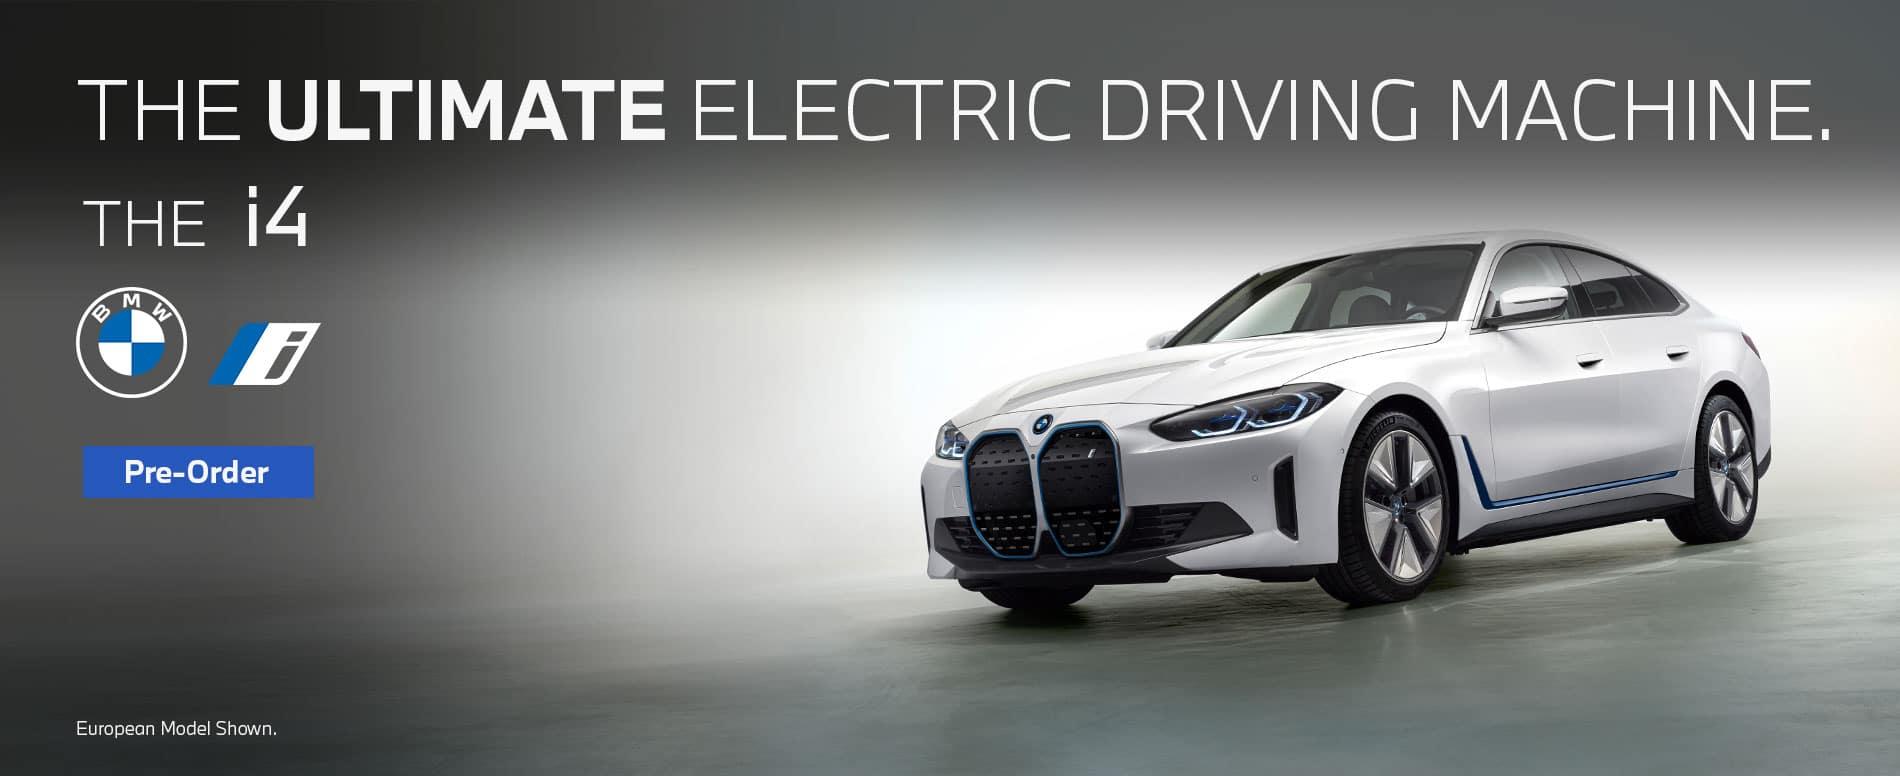 i4 pre order ultimate electric driving machine